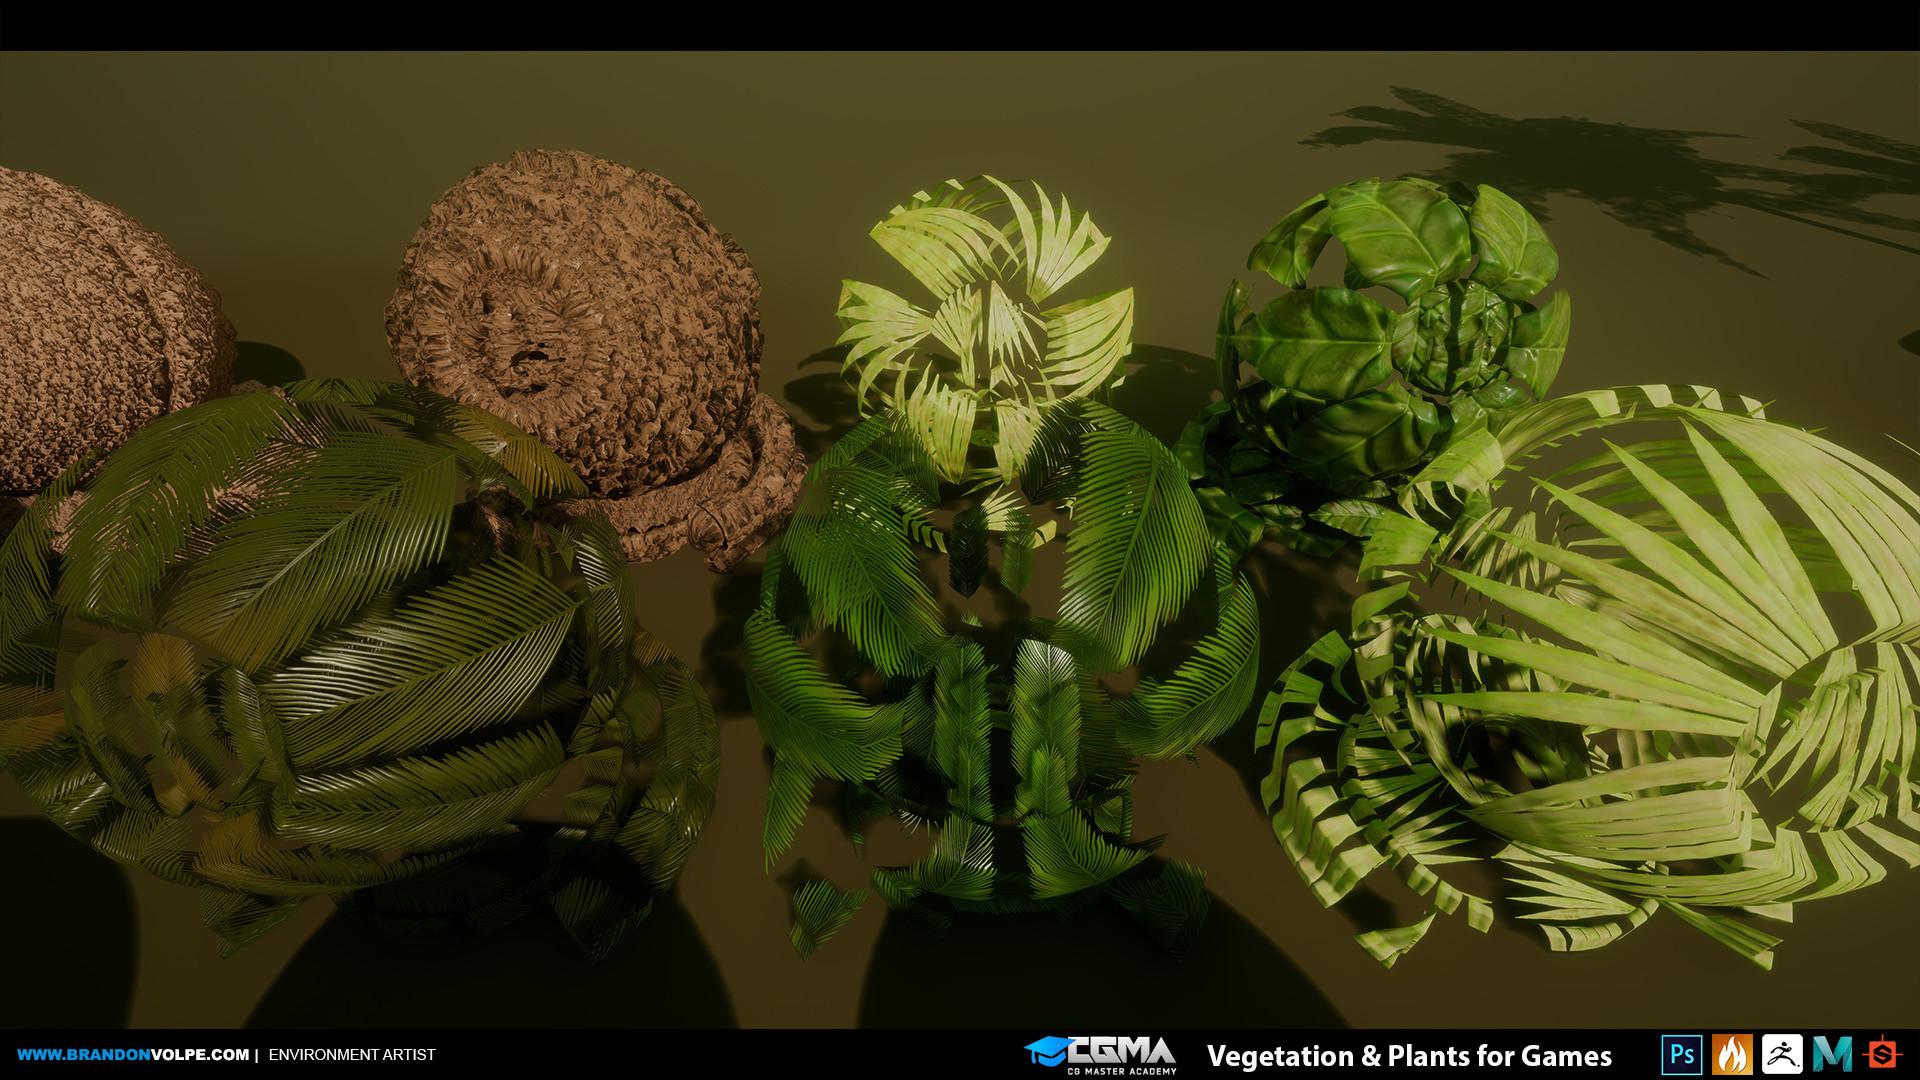 Brandon volpe brandonvolpe cgma vegplants 015